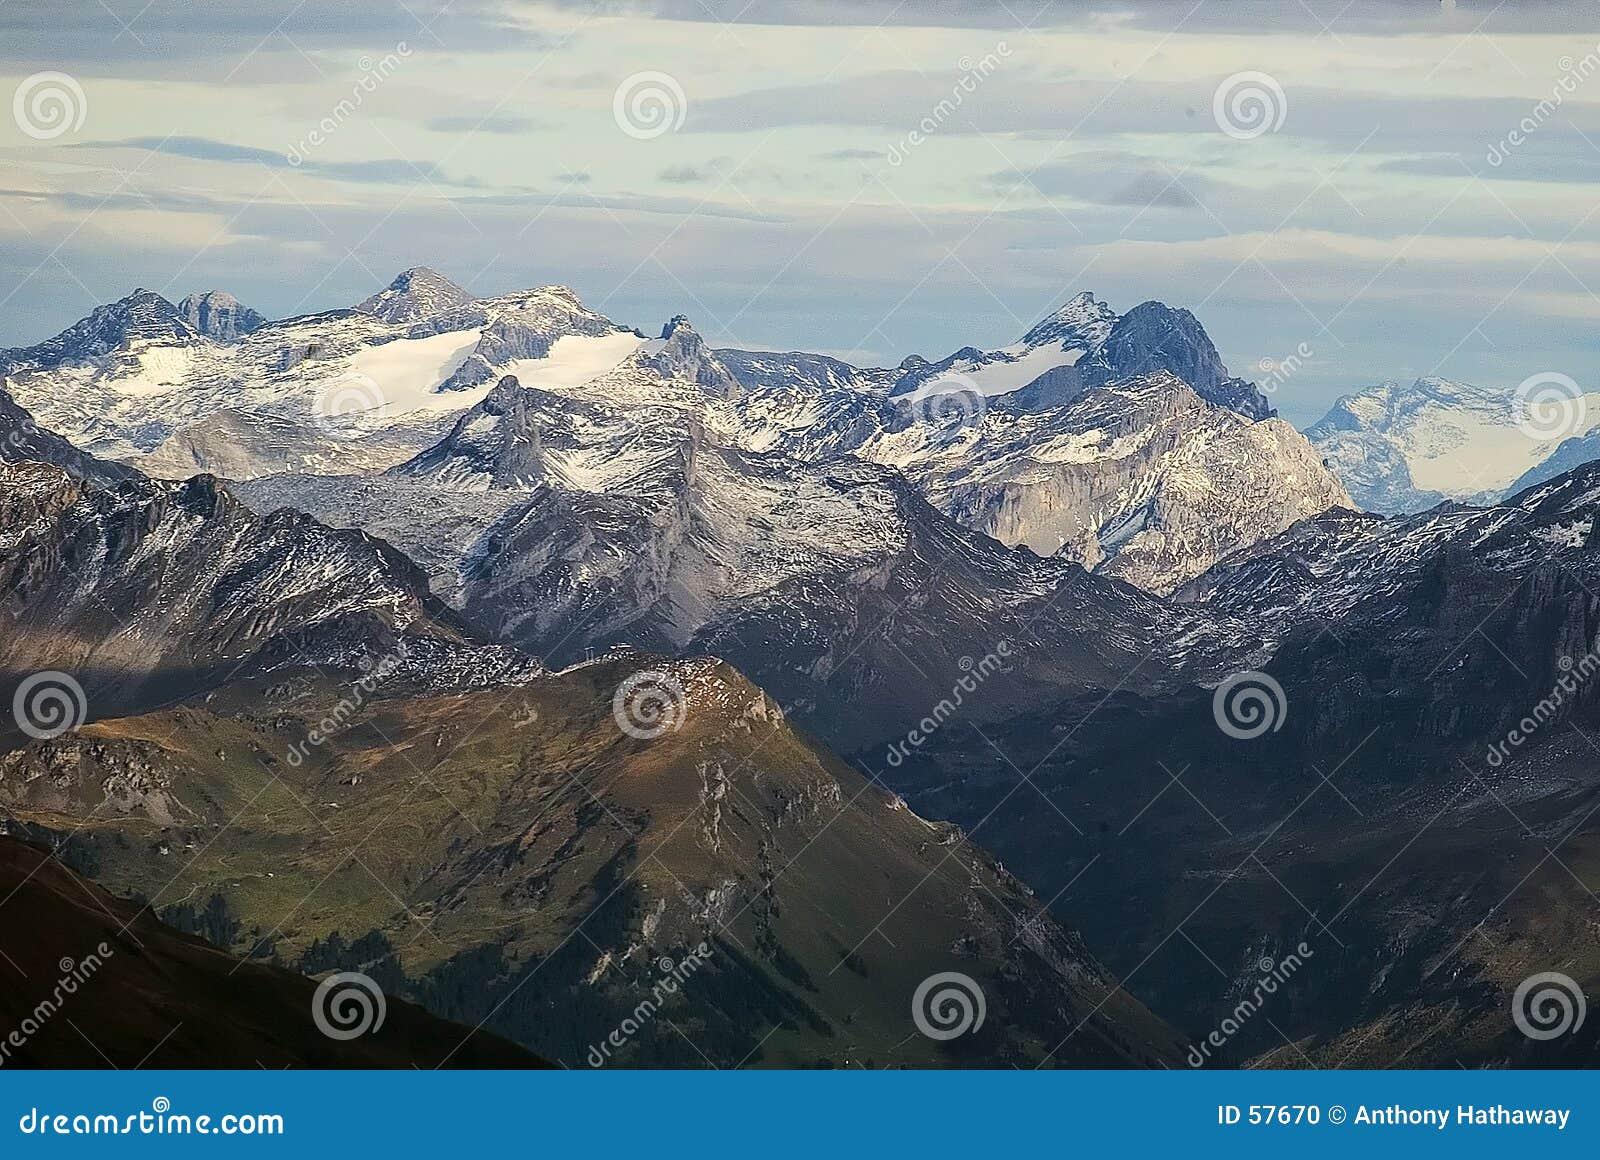 Alpiene bergen